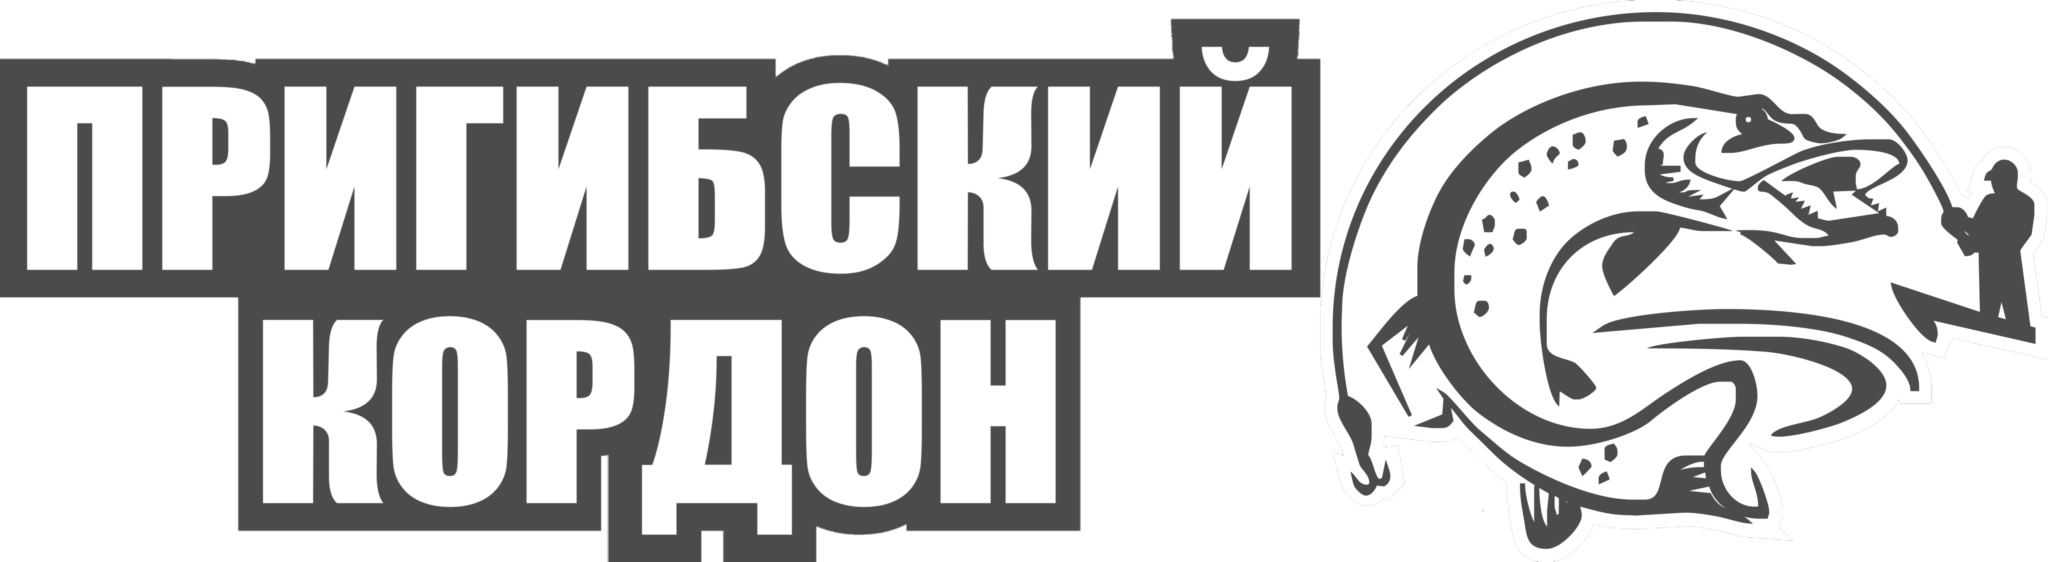 "Дом рыбака & охотника ""Пригибский Кордон"""